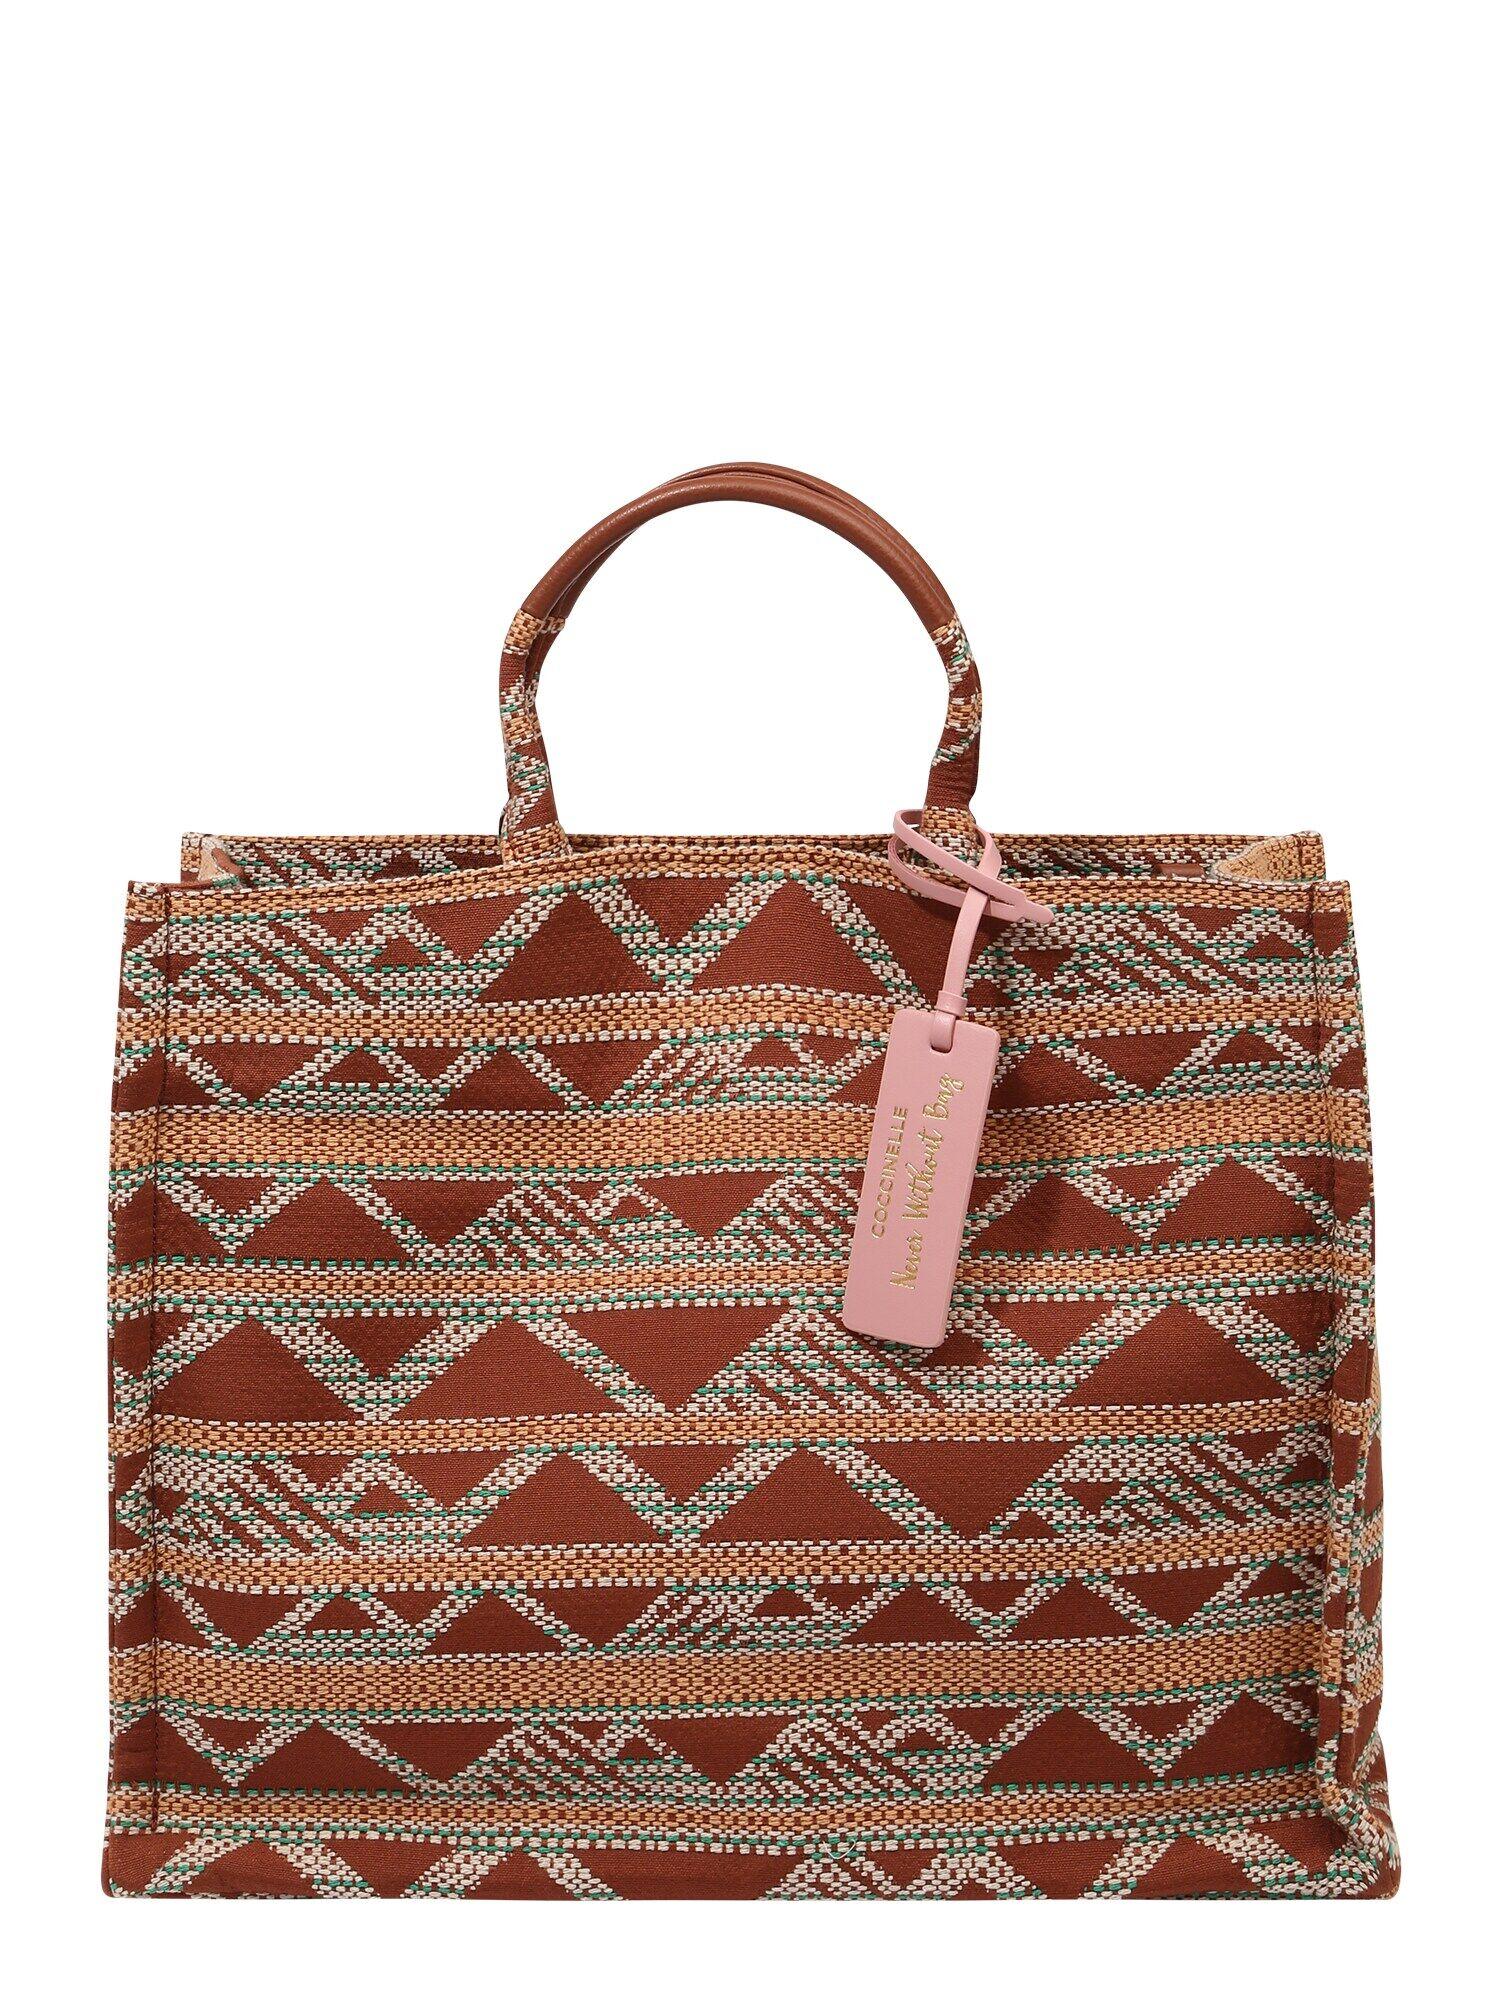 coccinelle shopper 'never without bag' colori misti